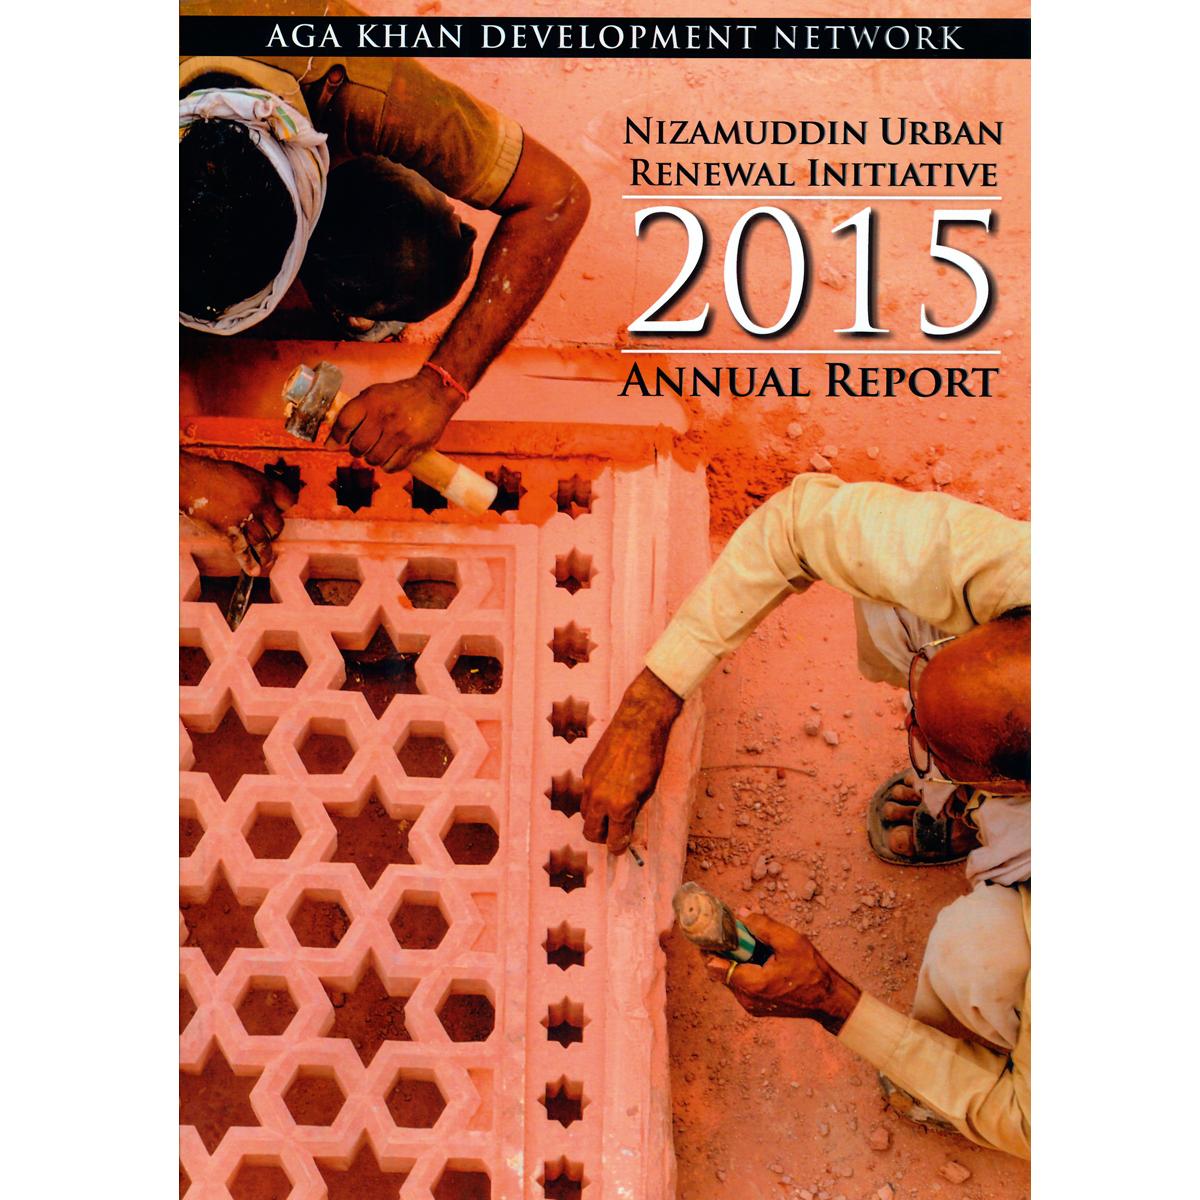 Nizamuddin Urban Renewal Initiative